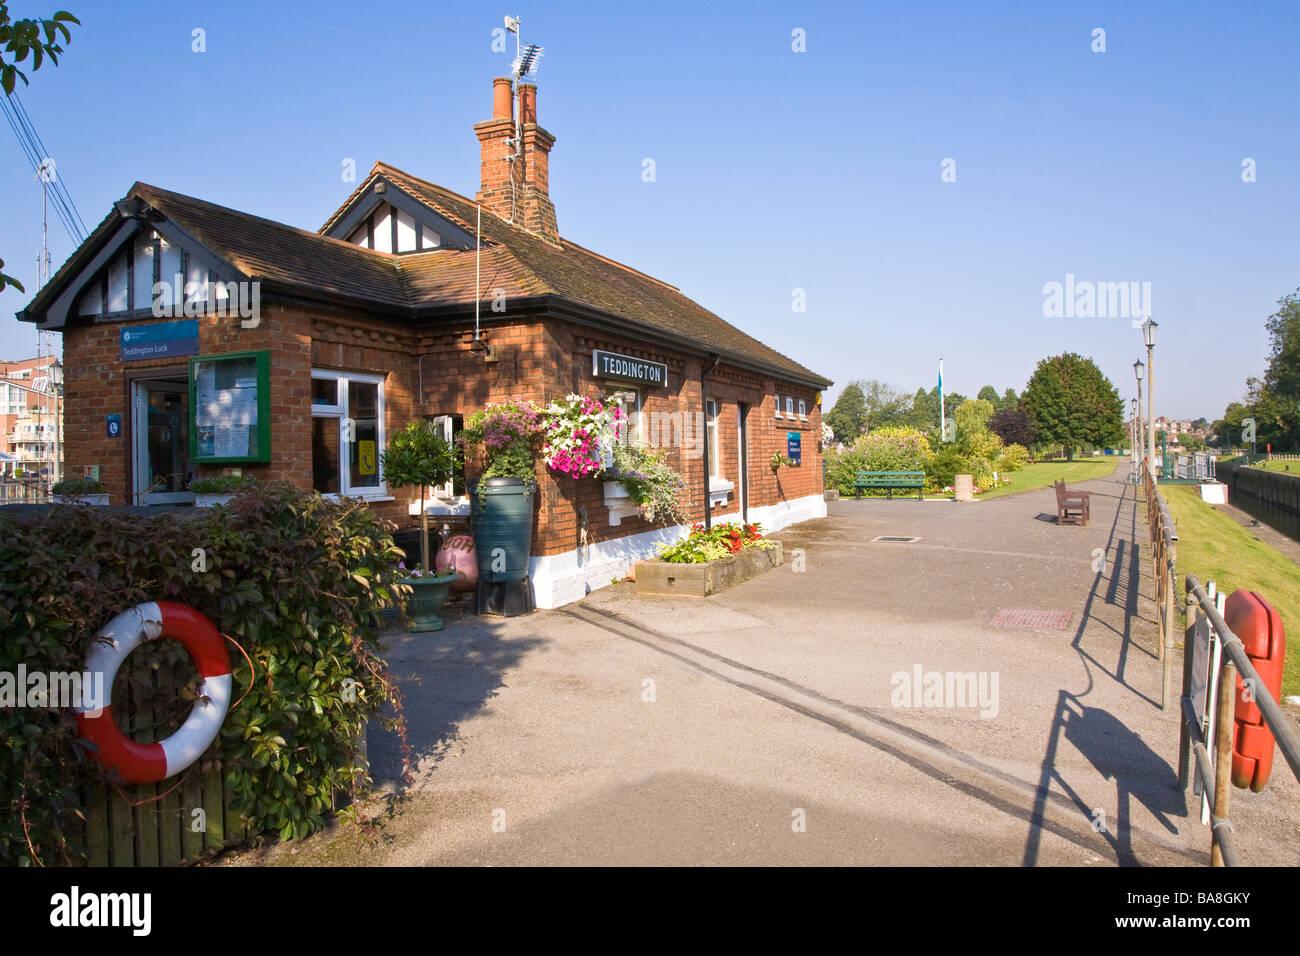 Former lock keepers cottage at Teddington Lock looking downstream towards Twickenham and Richmond - Stock Image